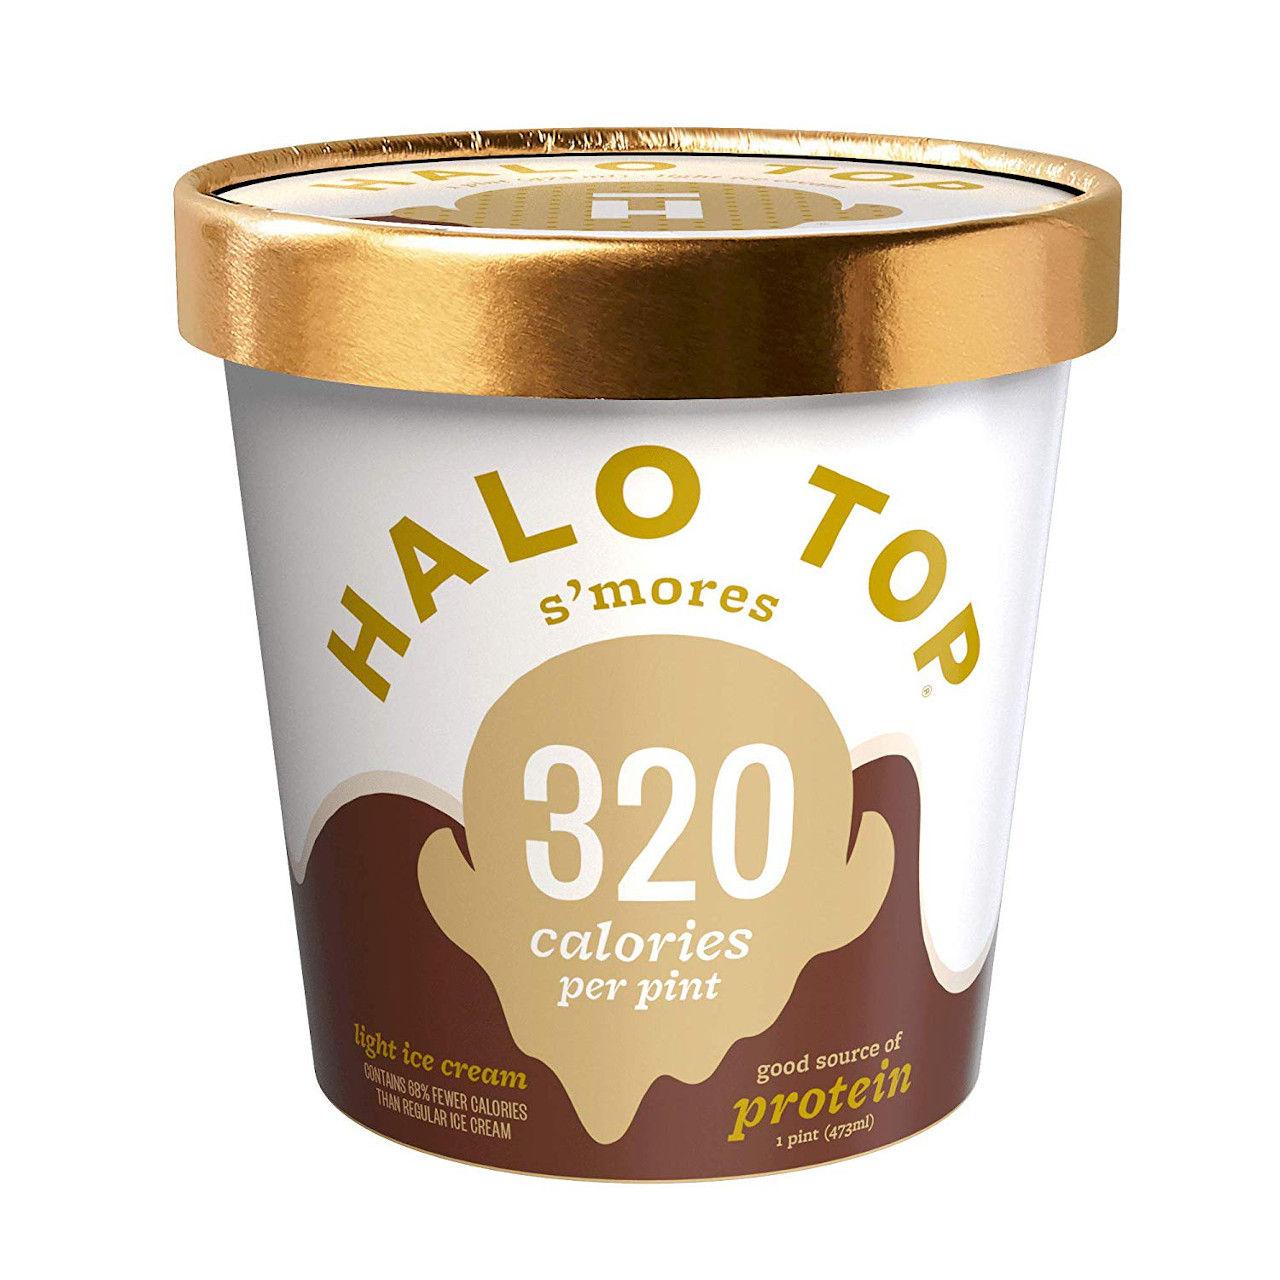 Halo Top Meal Plan For Skinny Guys